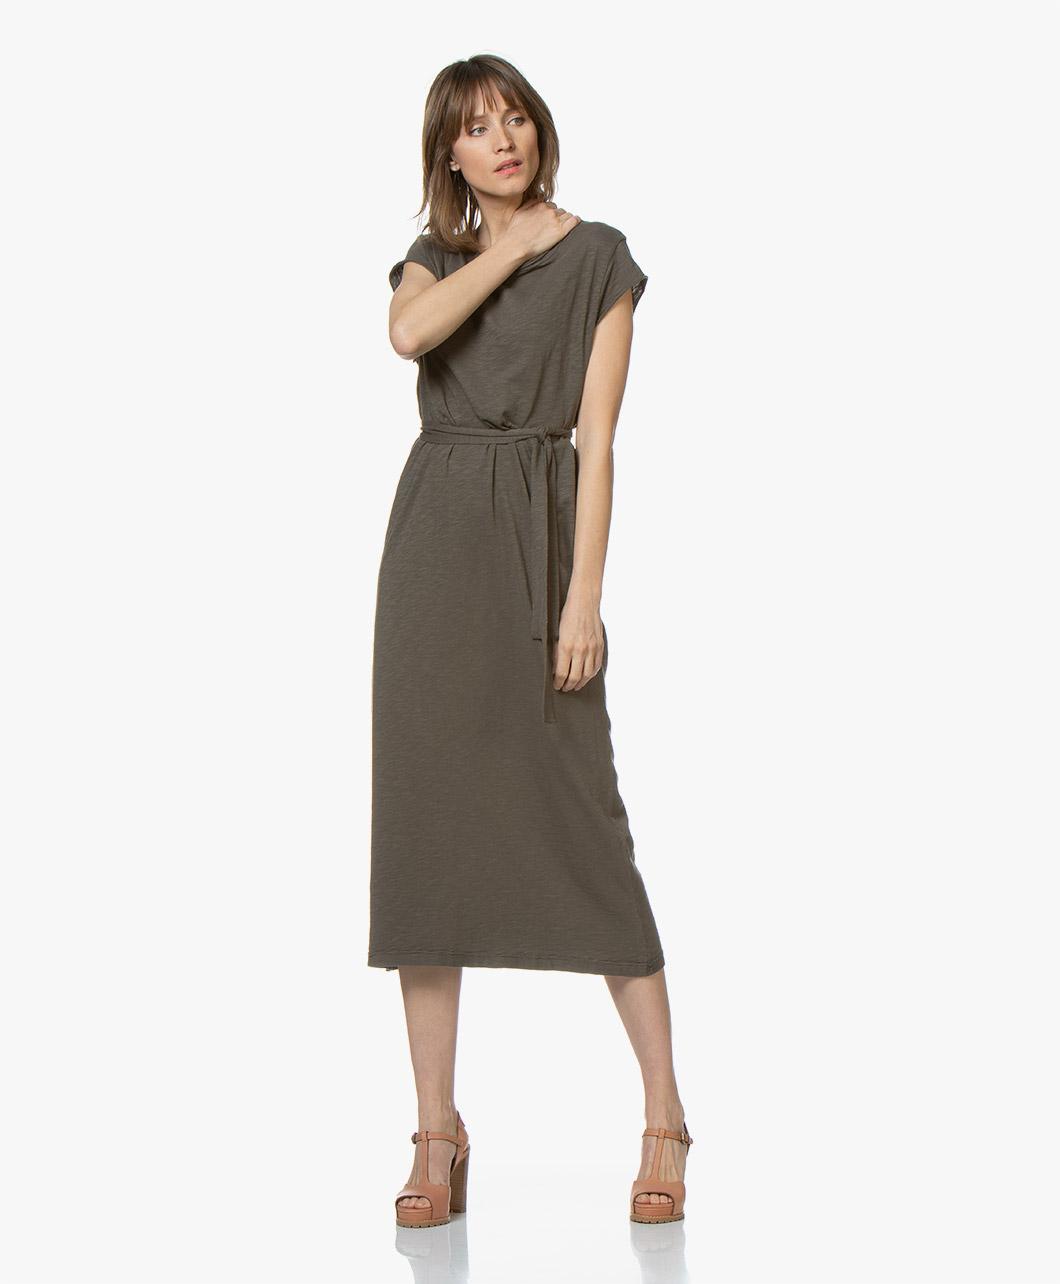 Immagine di American Vintage Dress Bysapick Jersey Midi in Bosq Green